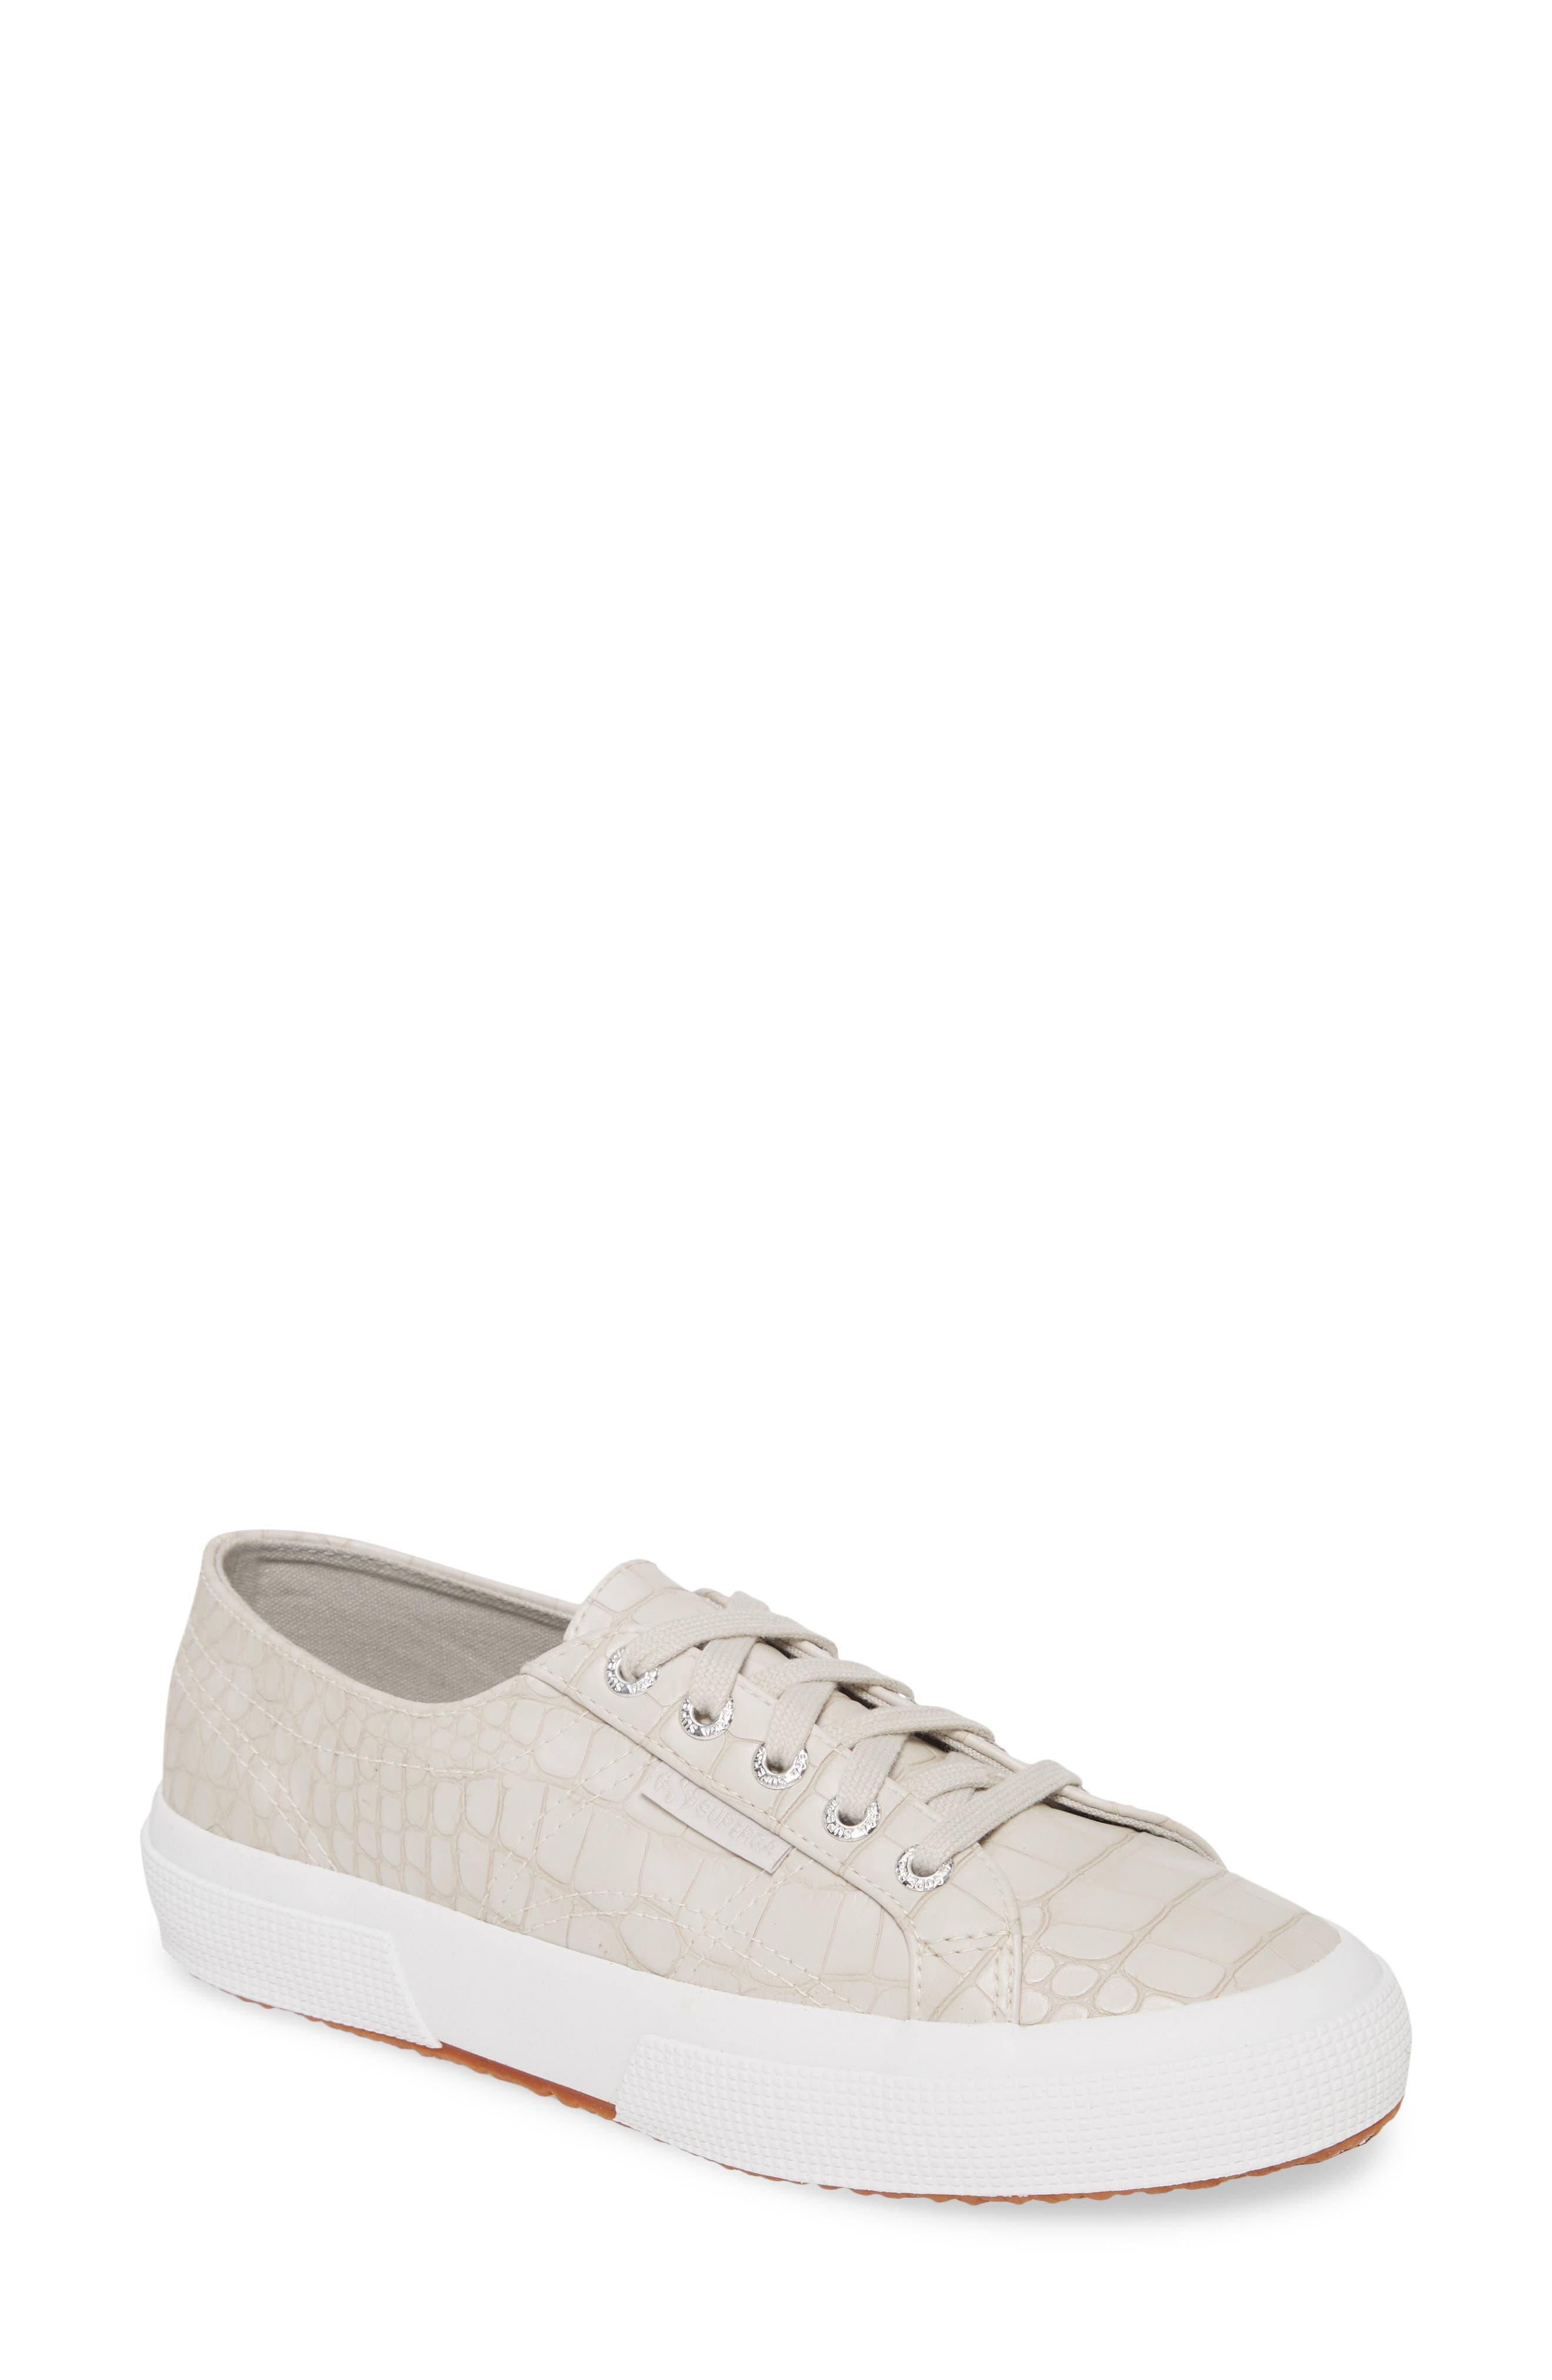 Superga | Croc Embossed Sneaker